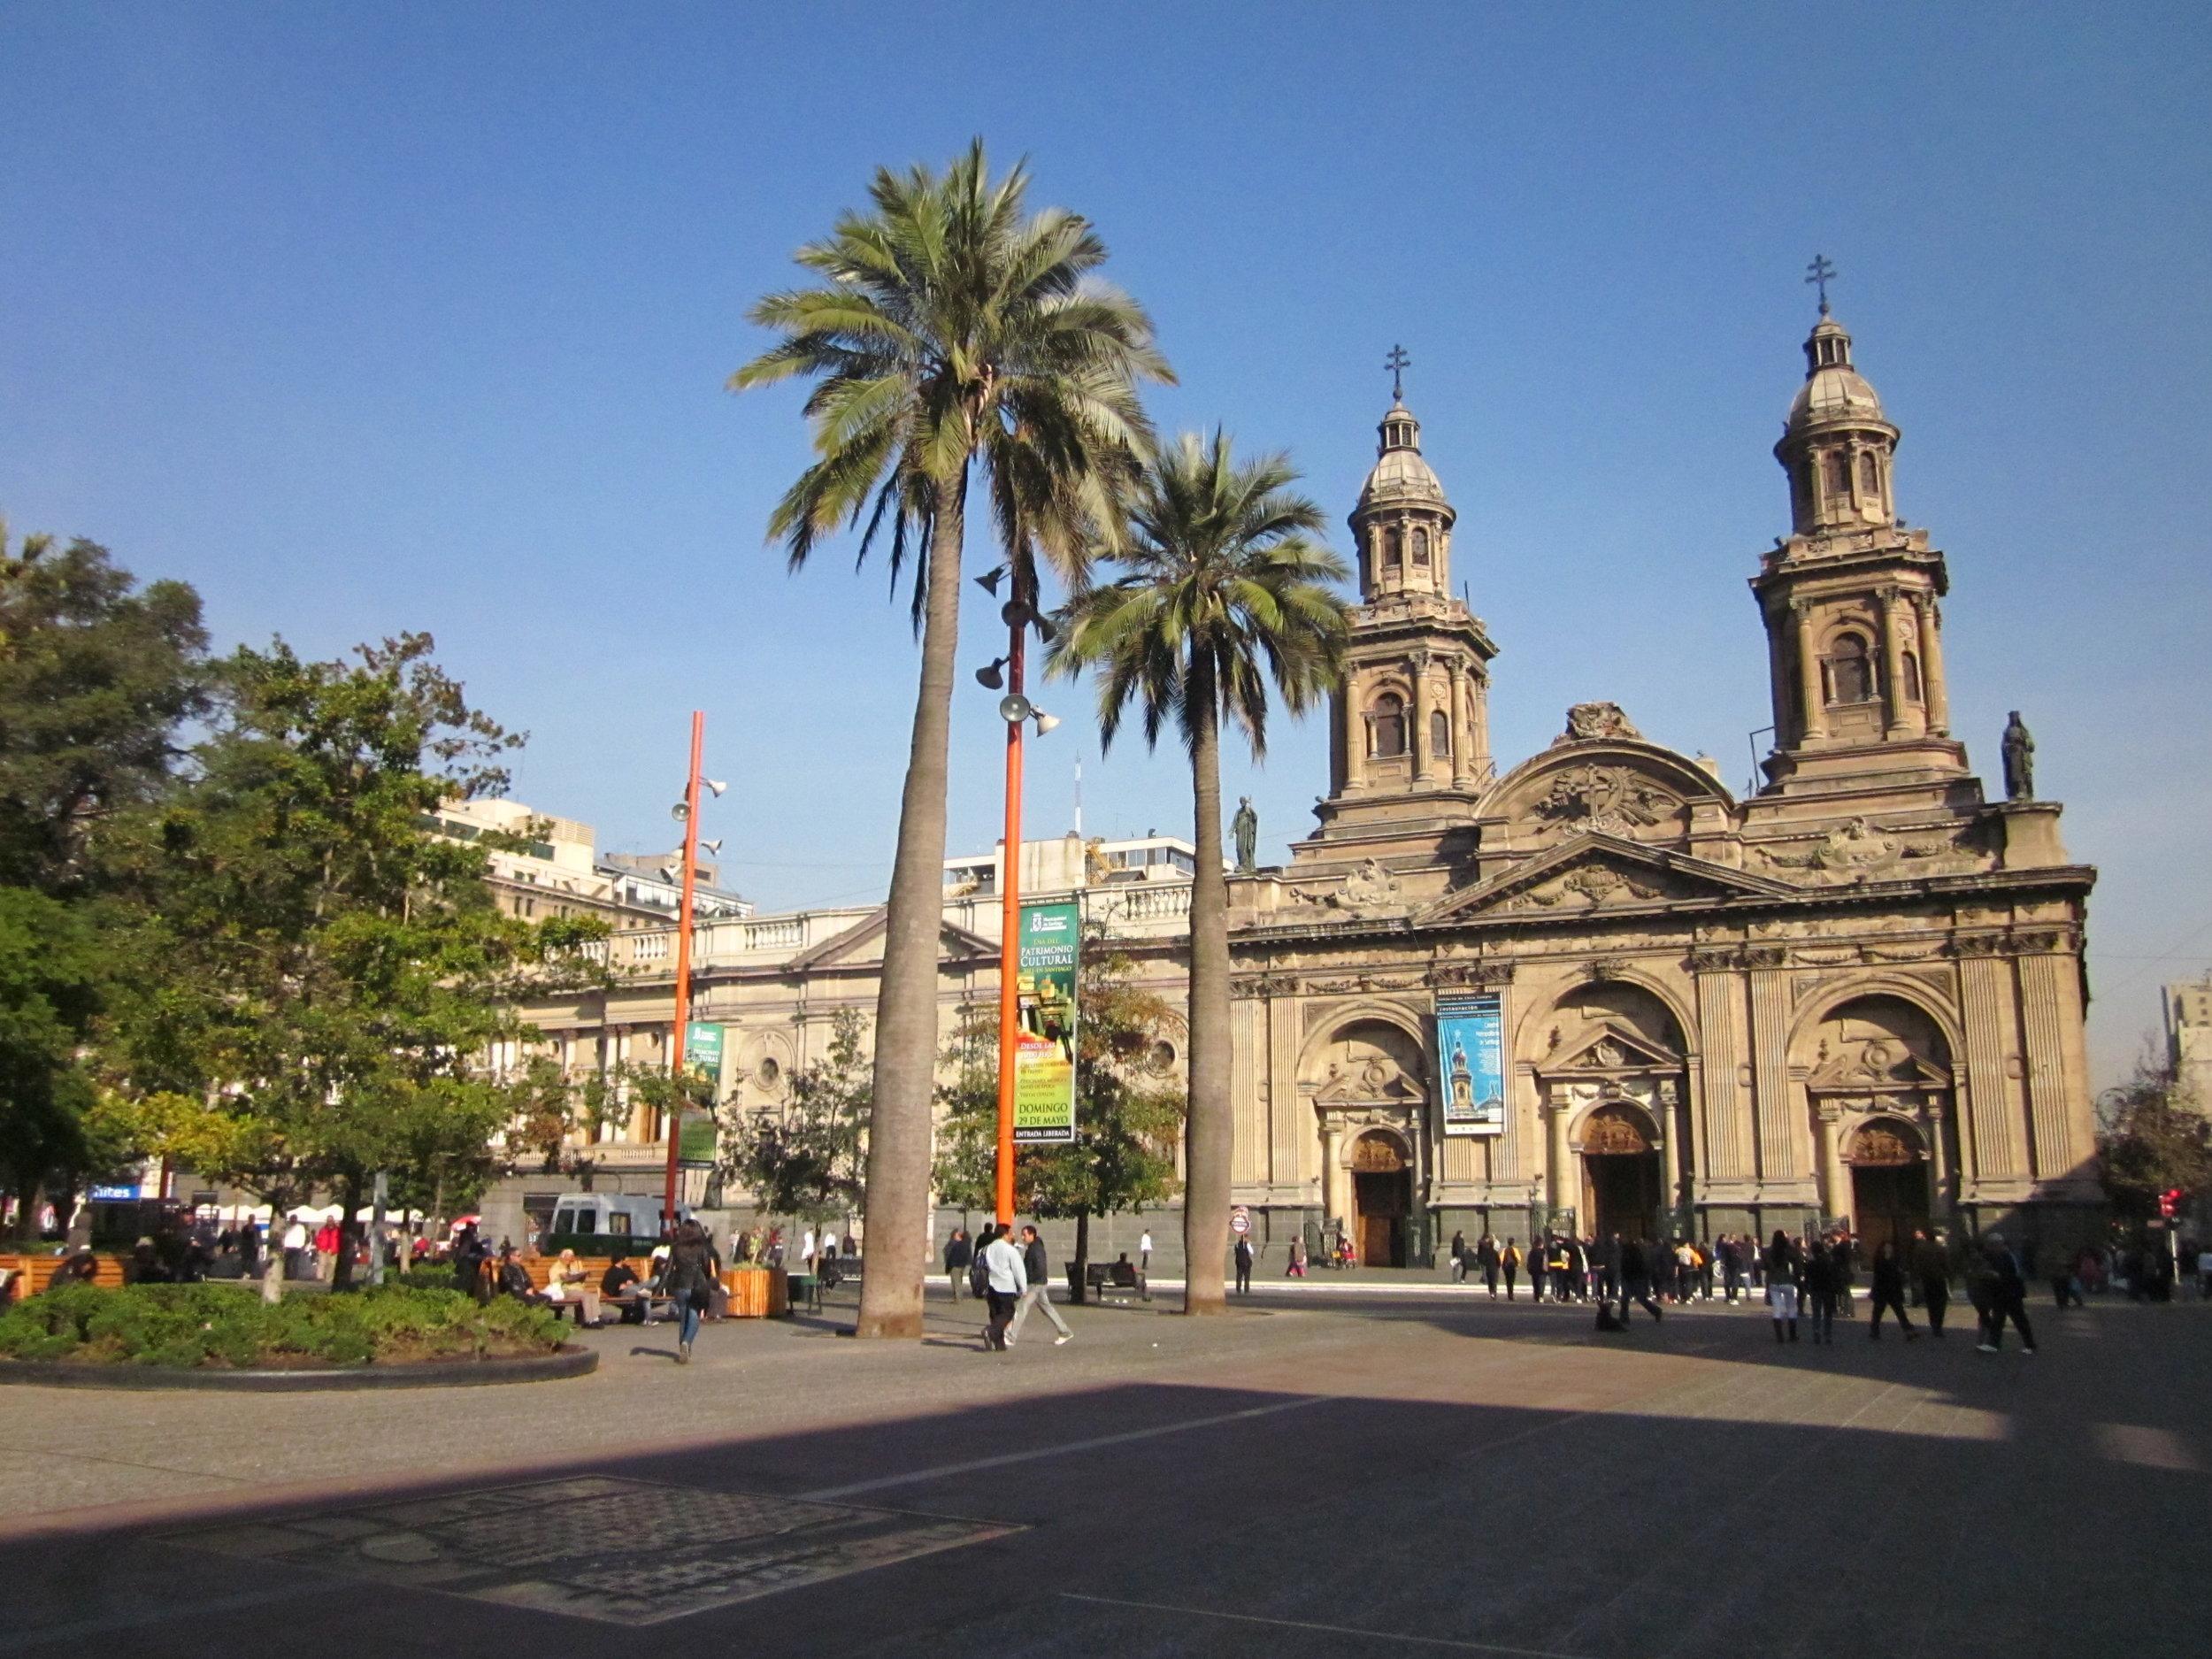 Plaza-de-Armas-1.jpg